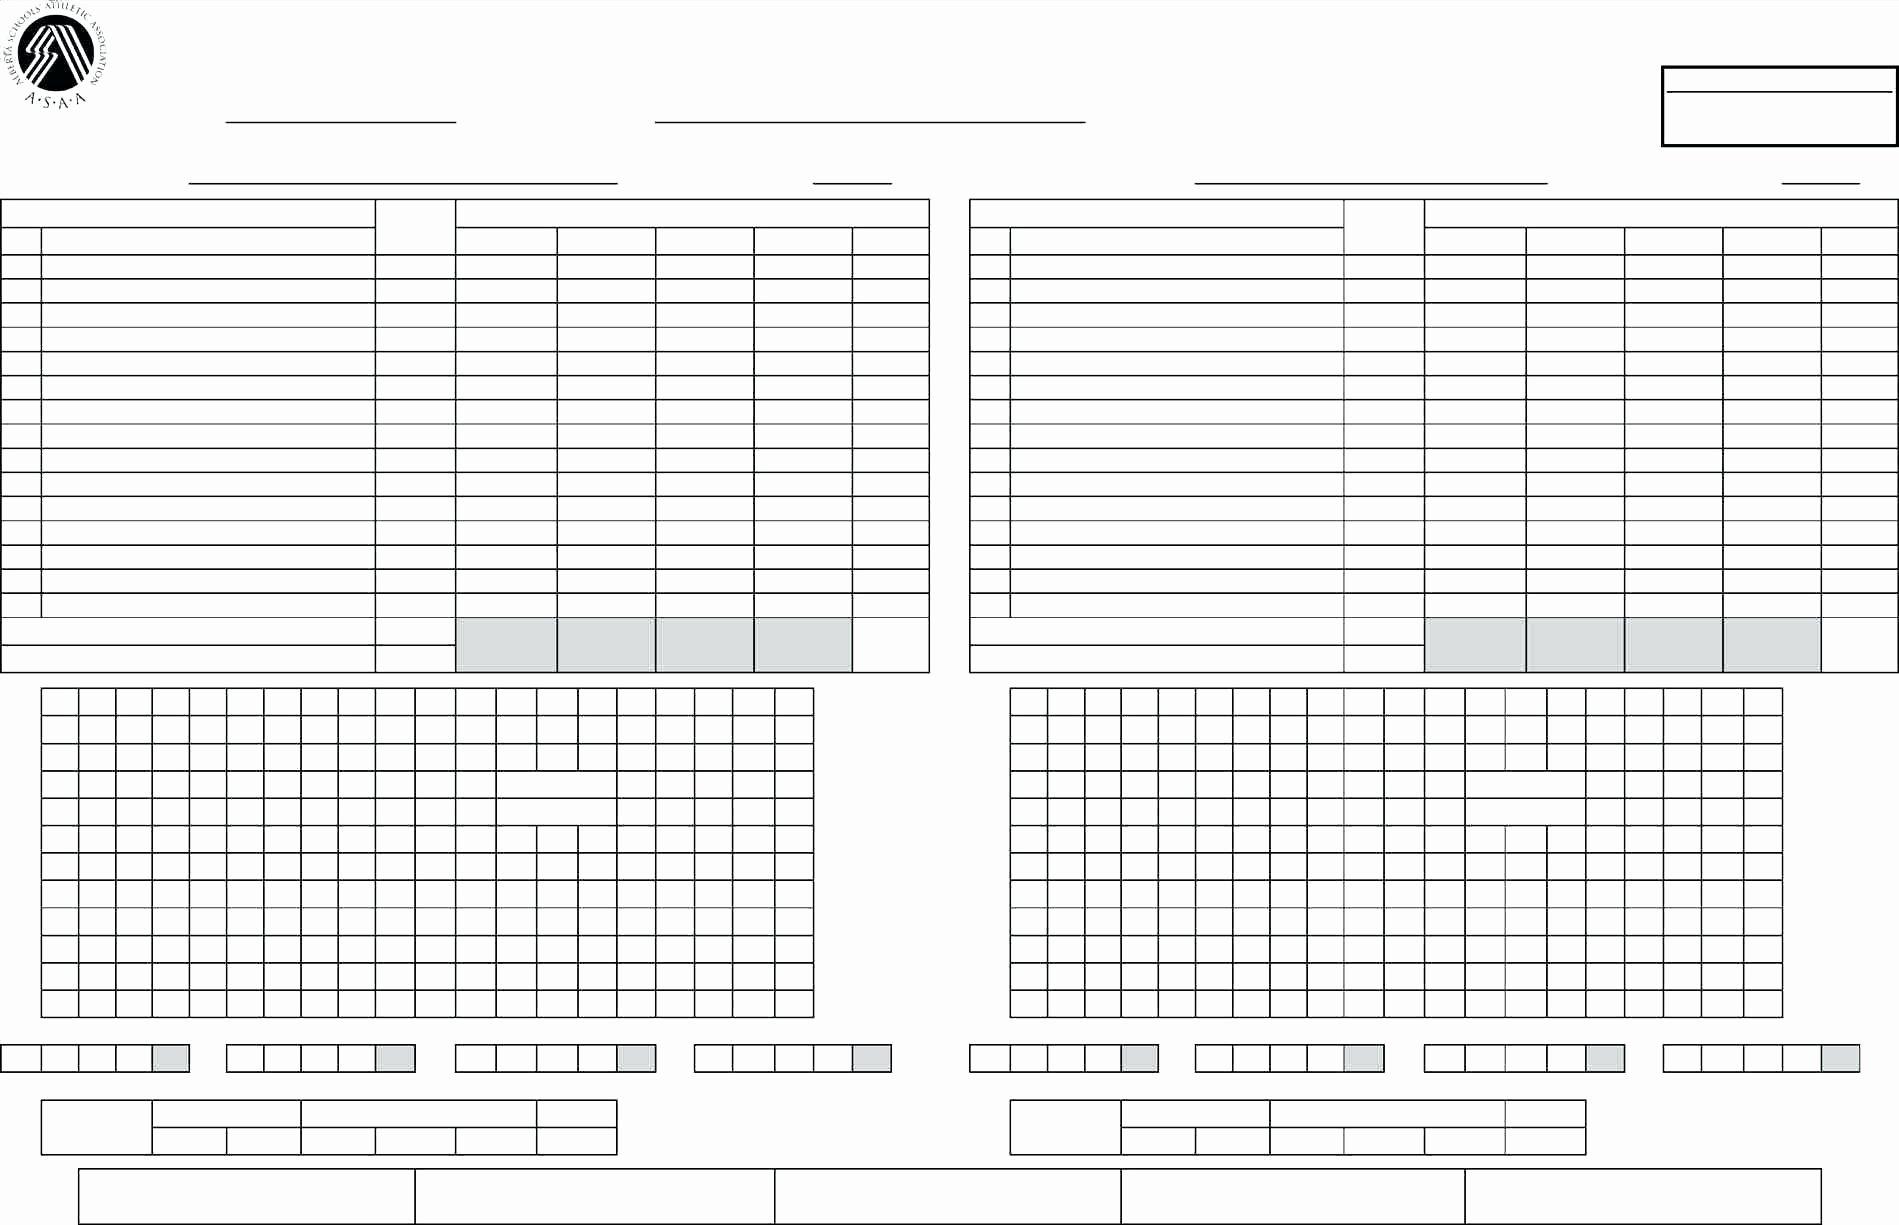 Football Depth Chart Template Excel Elegant Fensive Depth Chart Template Football